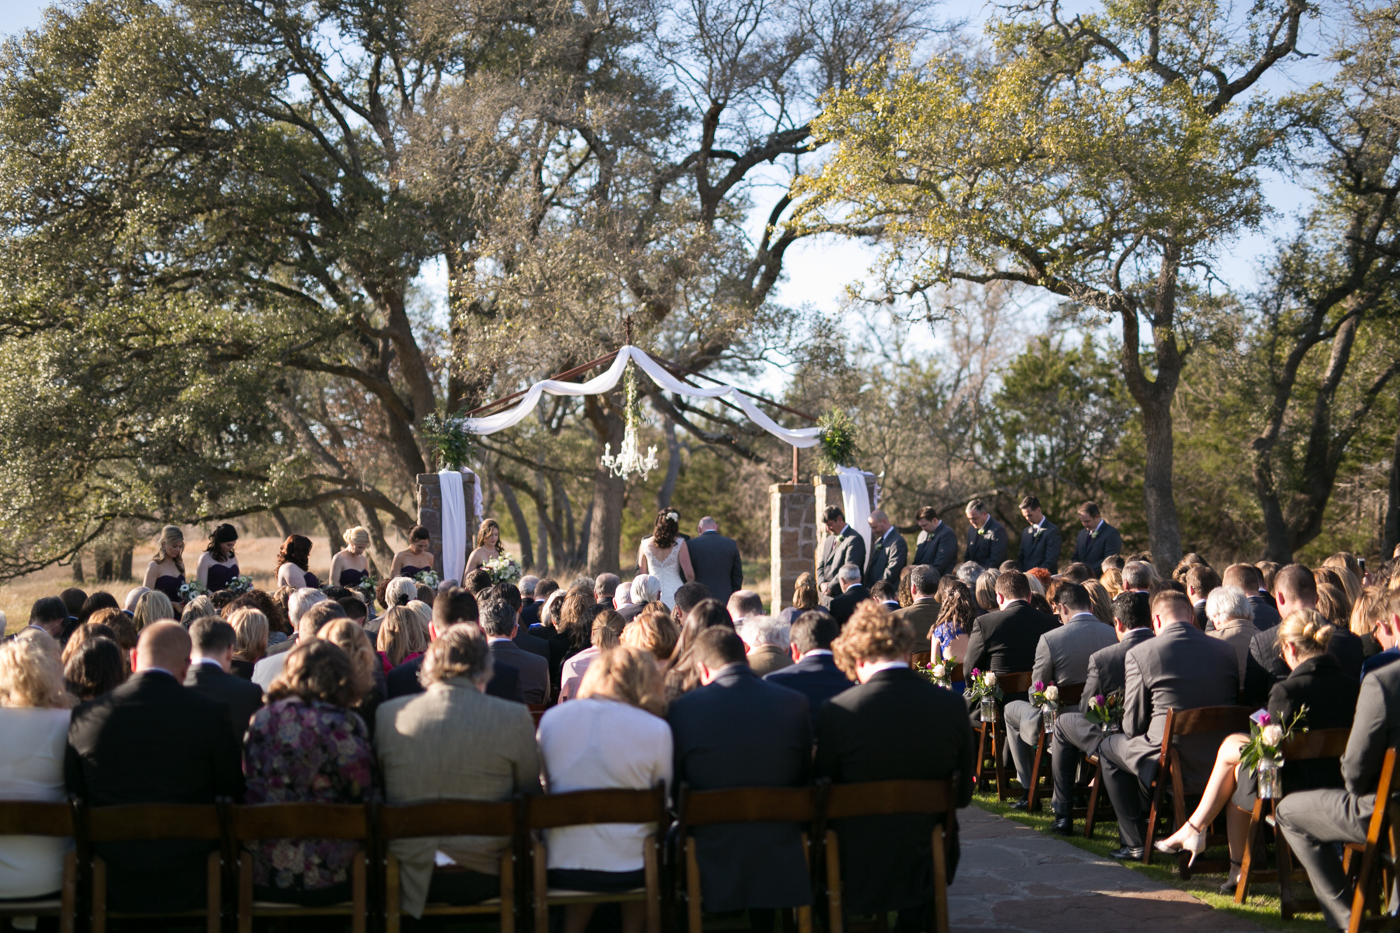 Austin-wedding-photo-and-video-021.jpg